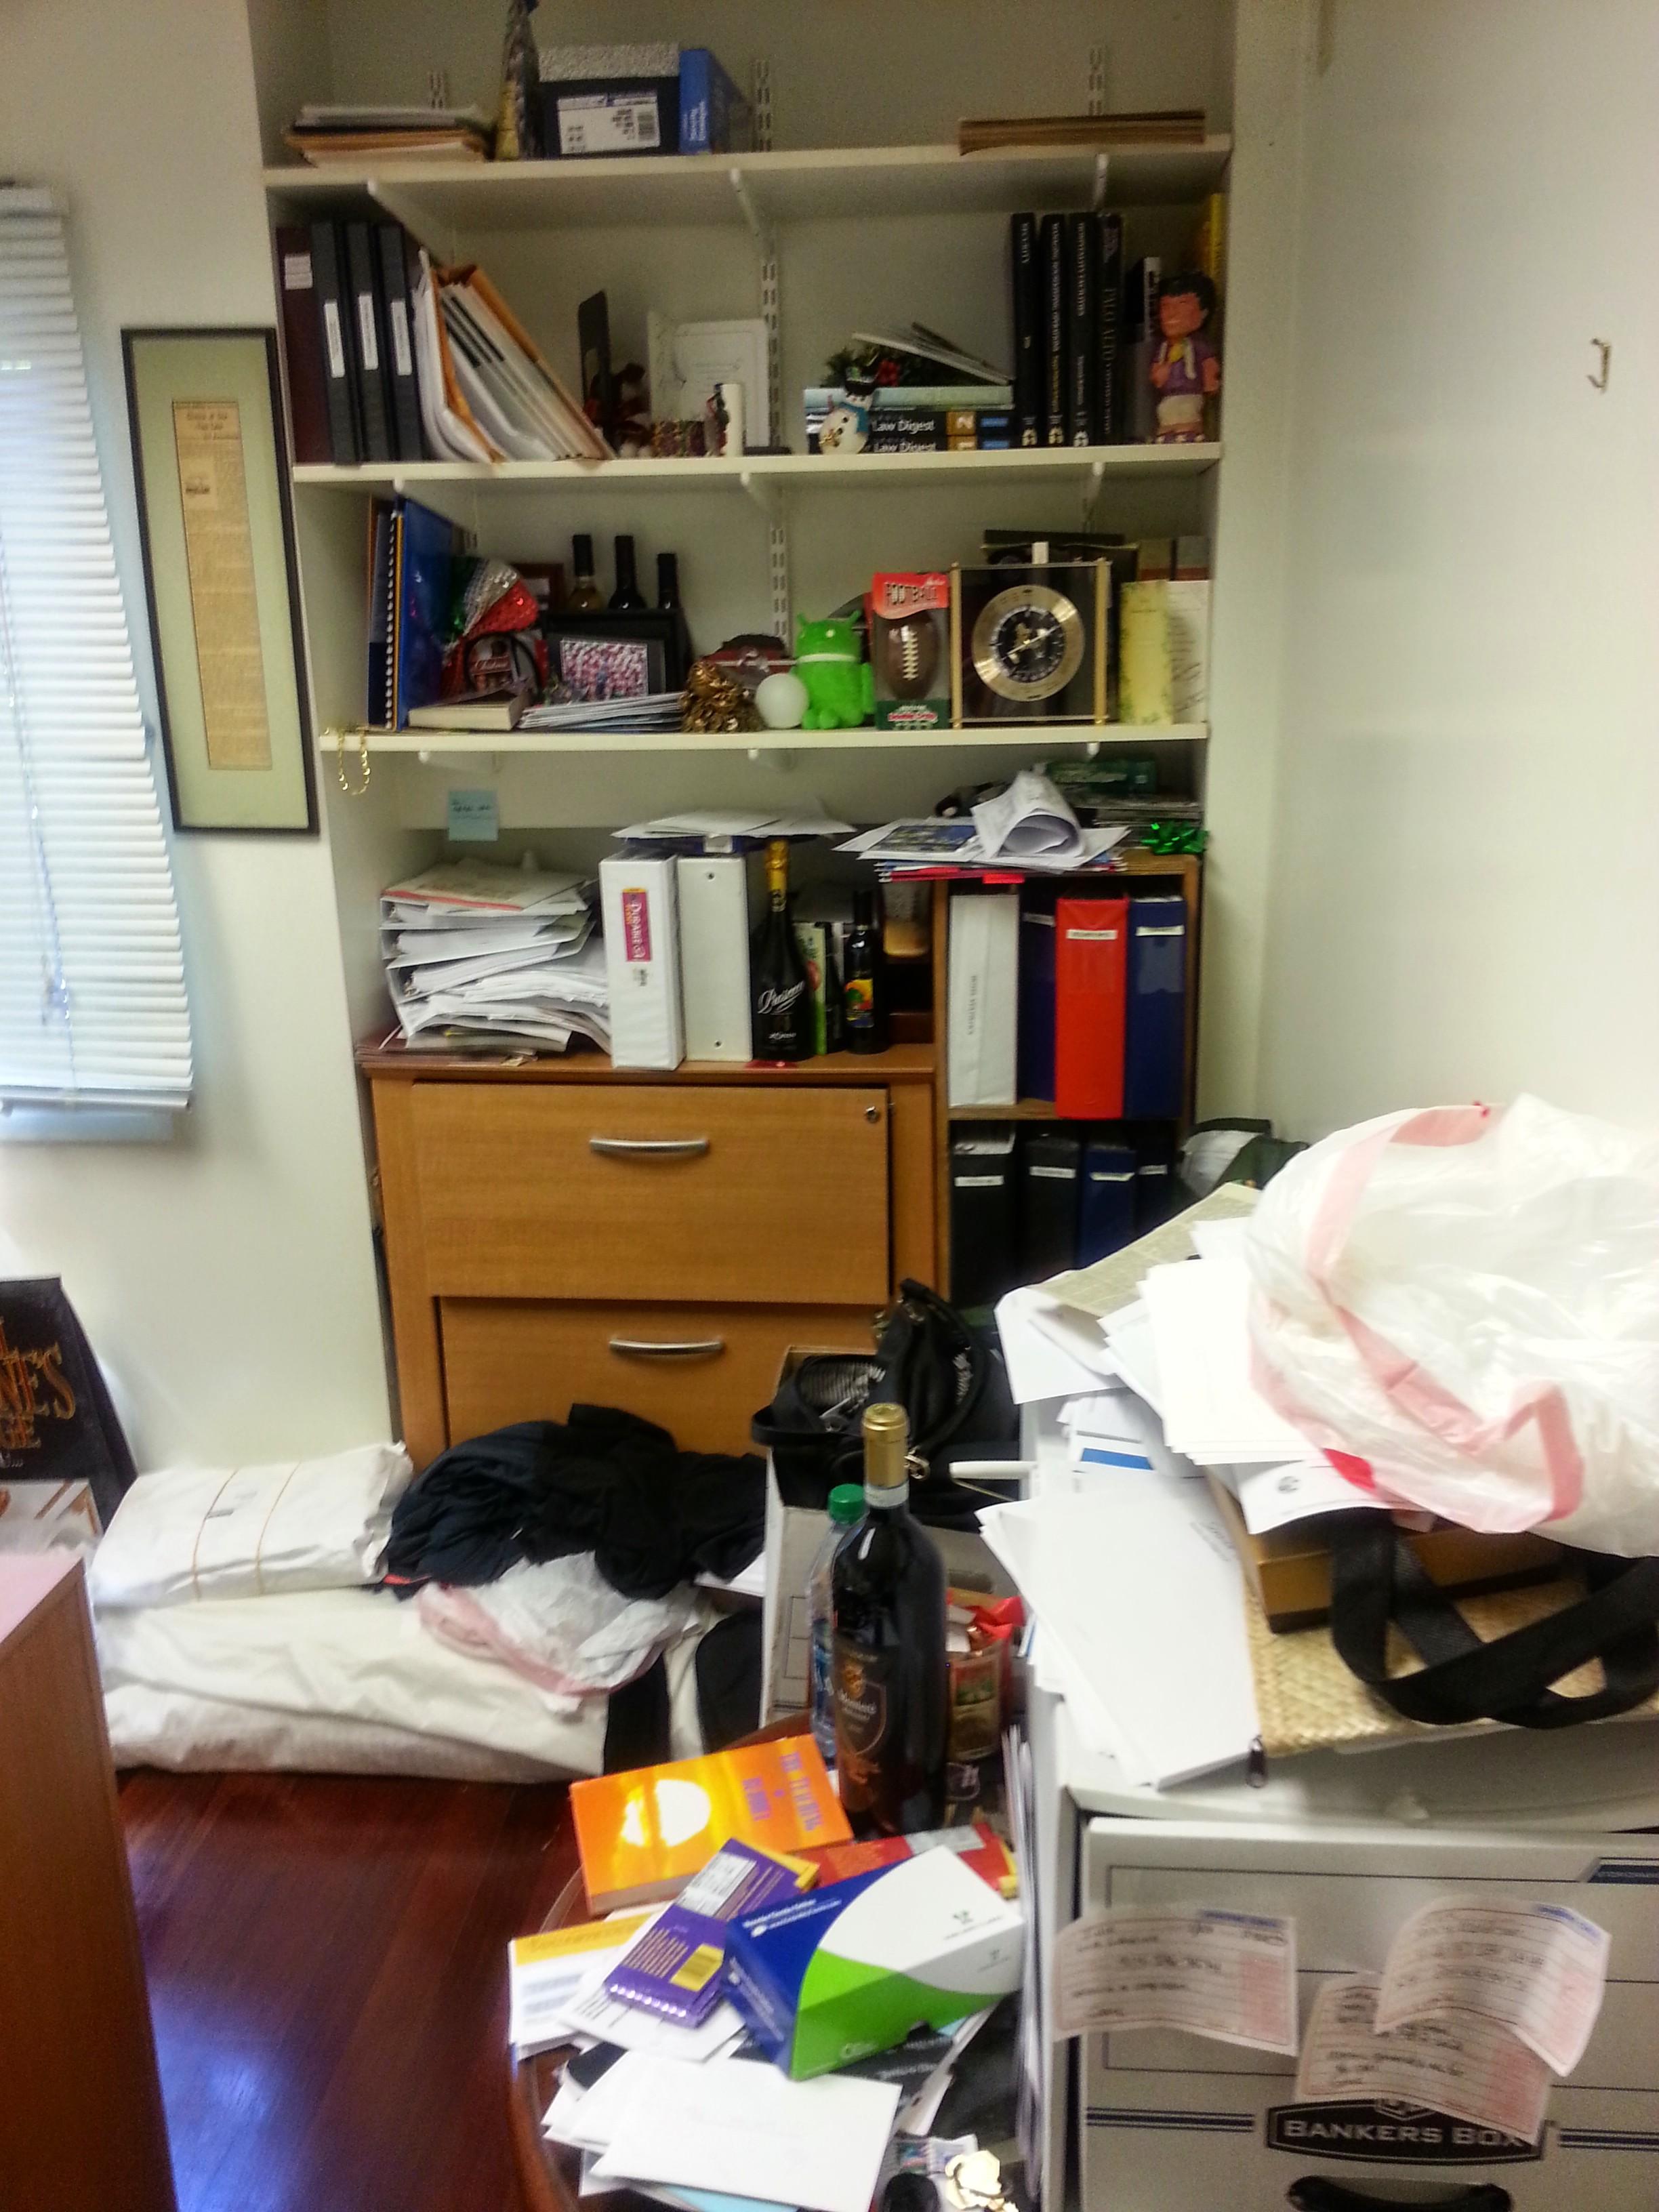 Disorganized bookcase